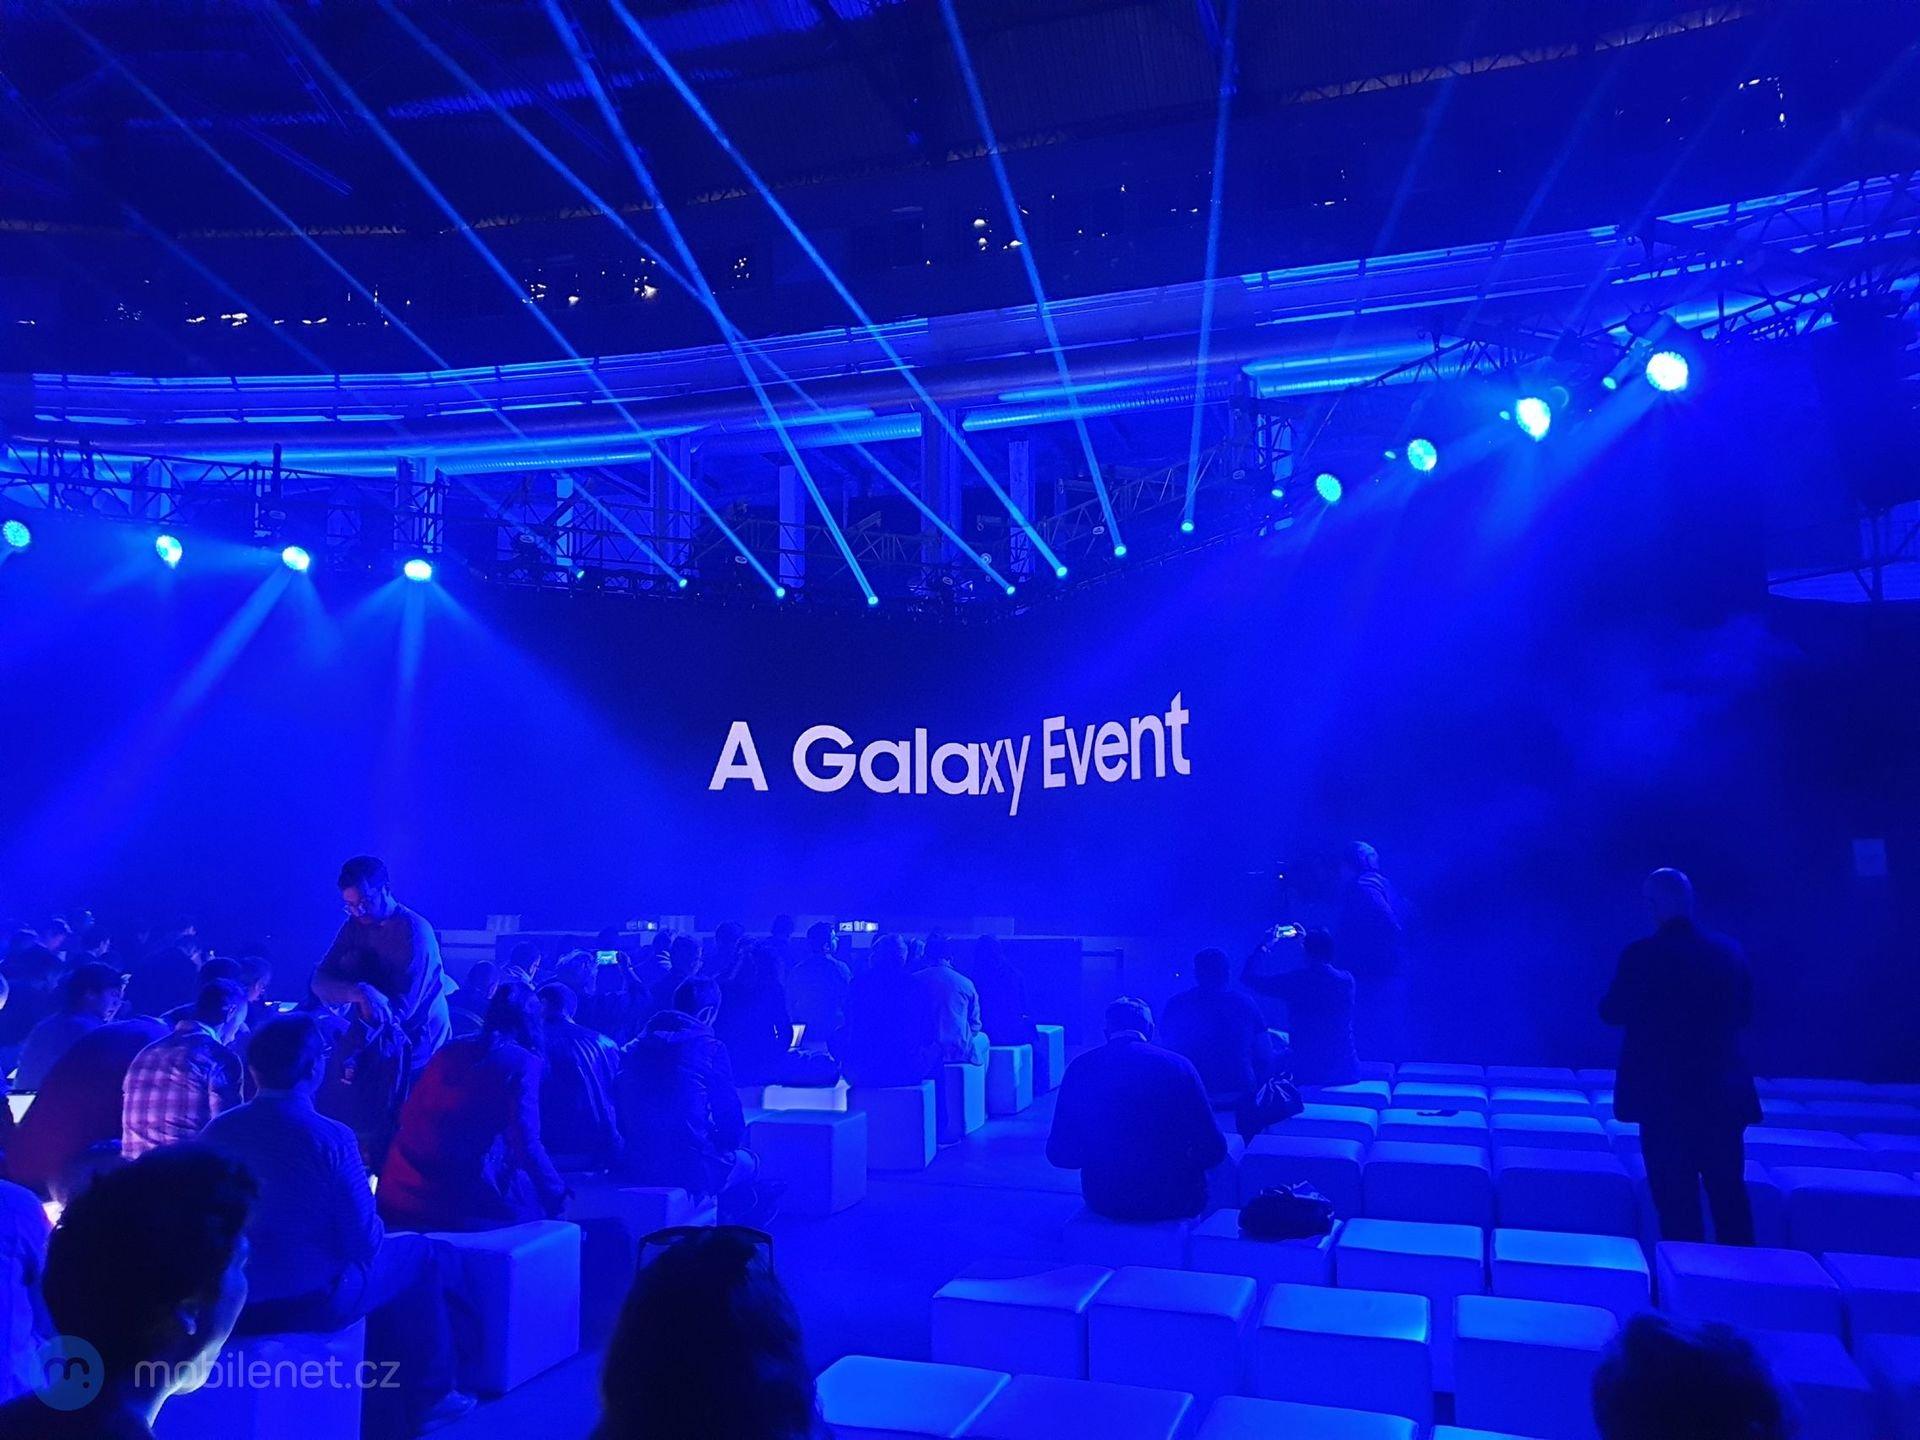 Galaxy A Event 2019